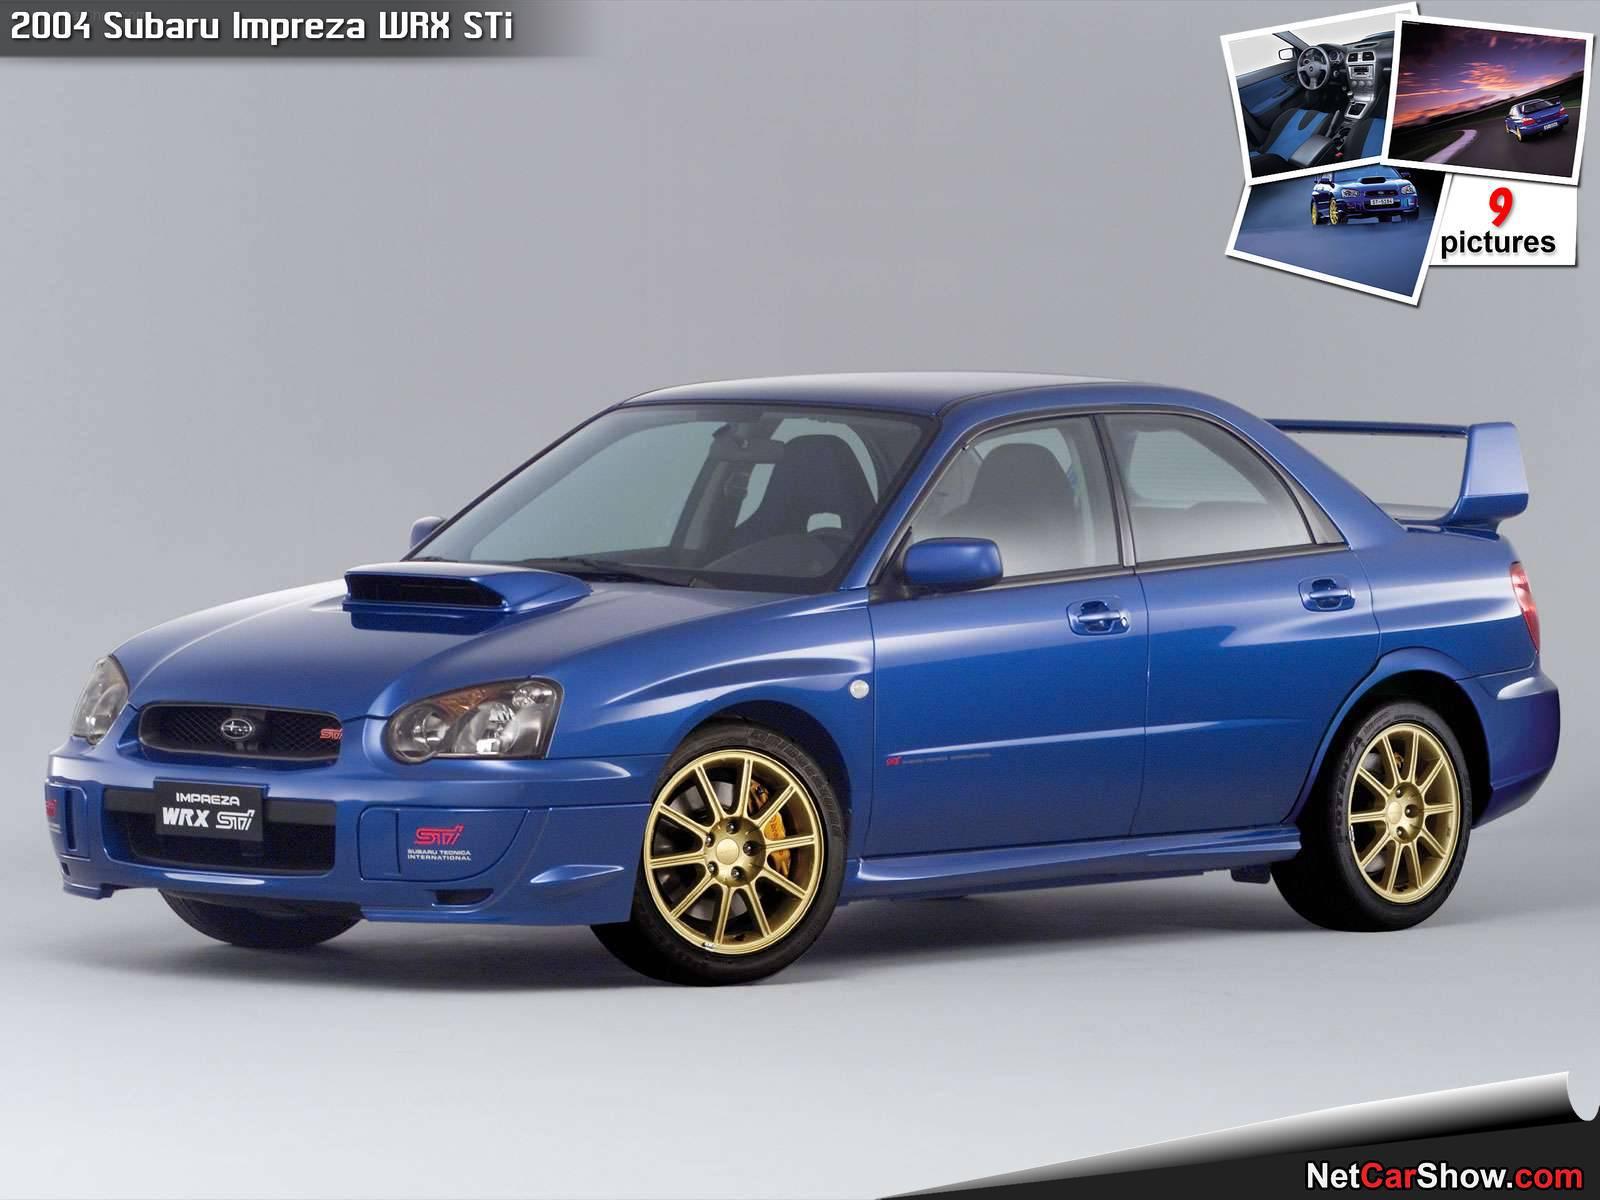 Beautiful Car Subaru Impreza Wrx Sti In Moscow Wallpapers